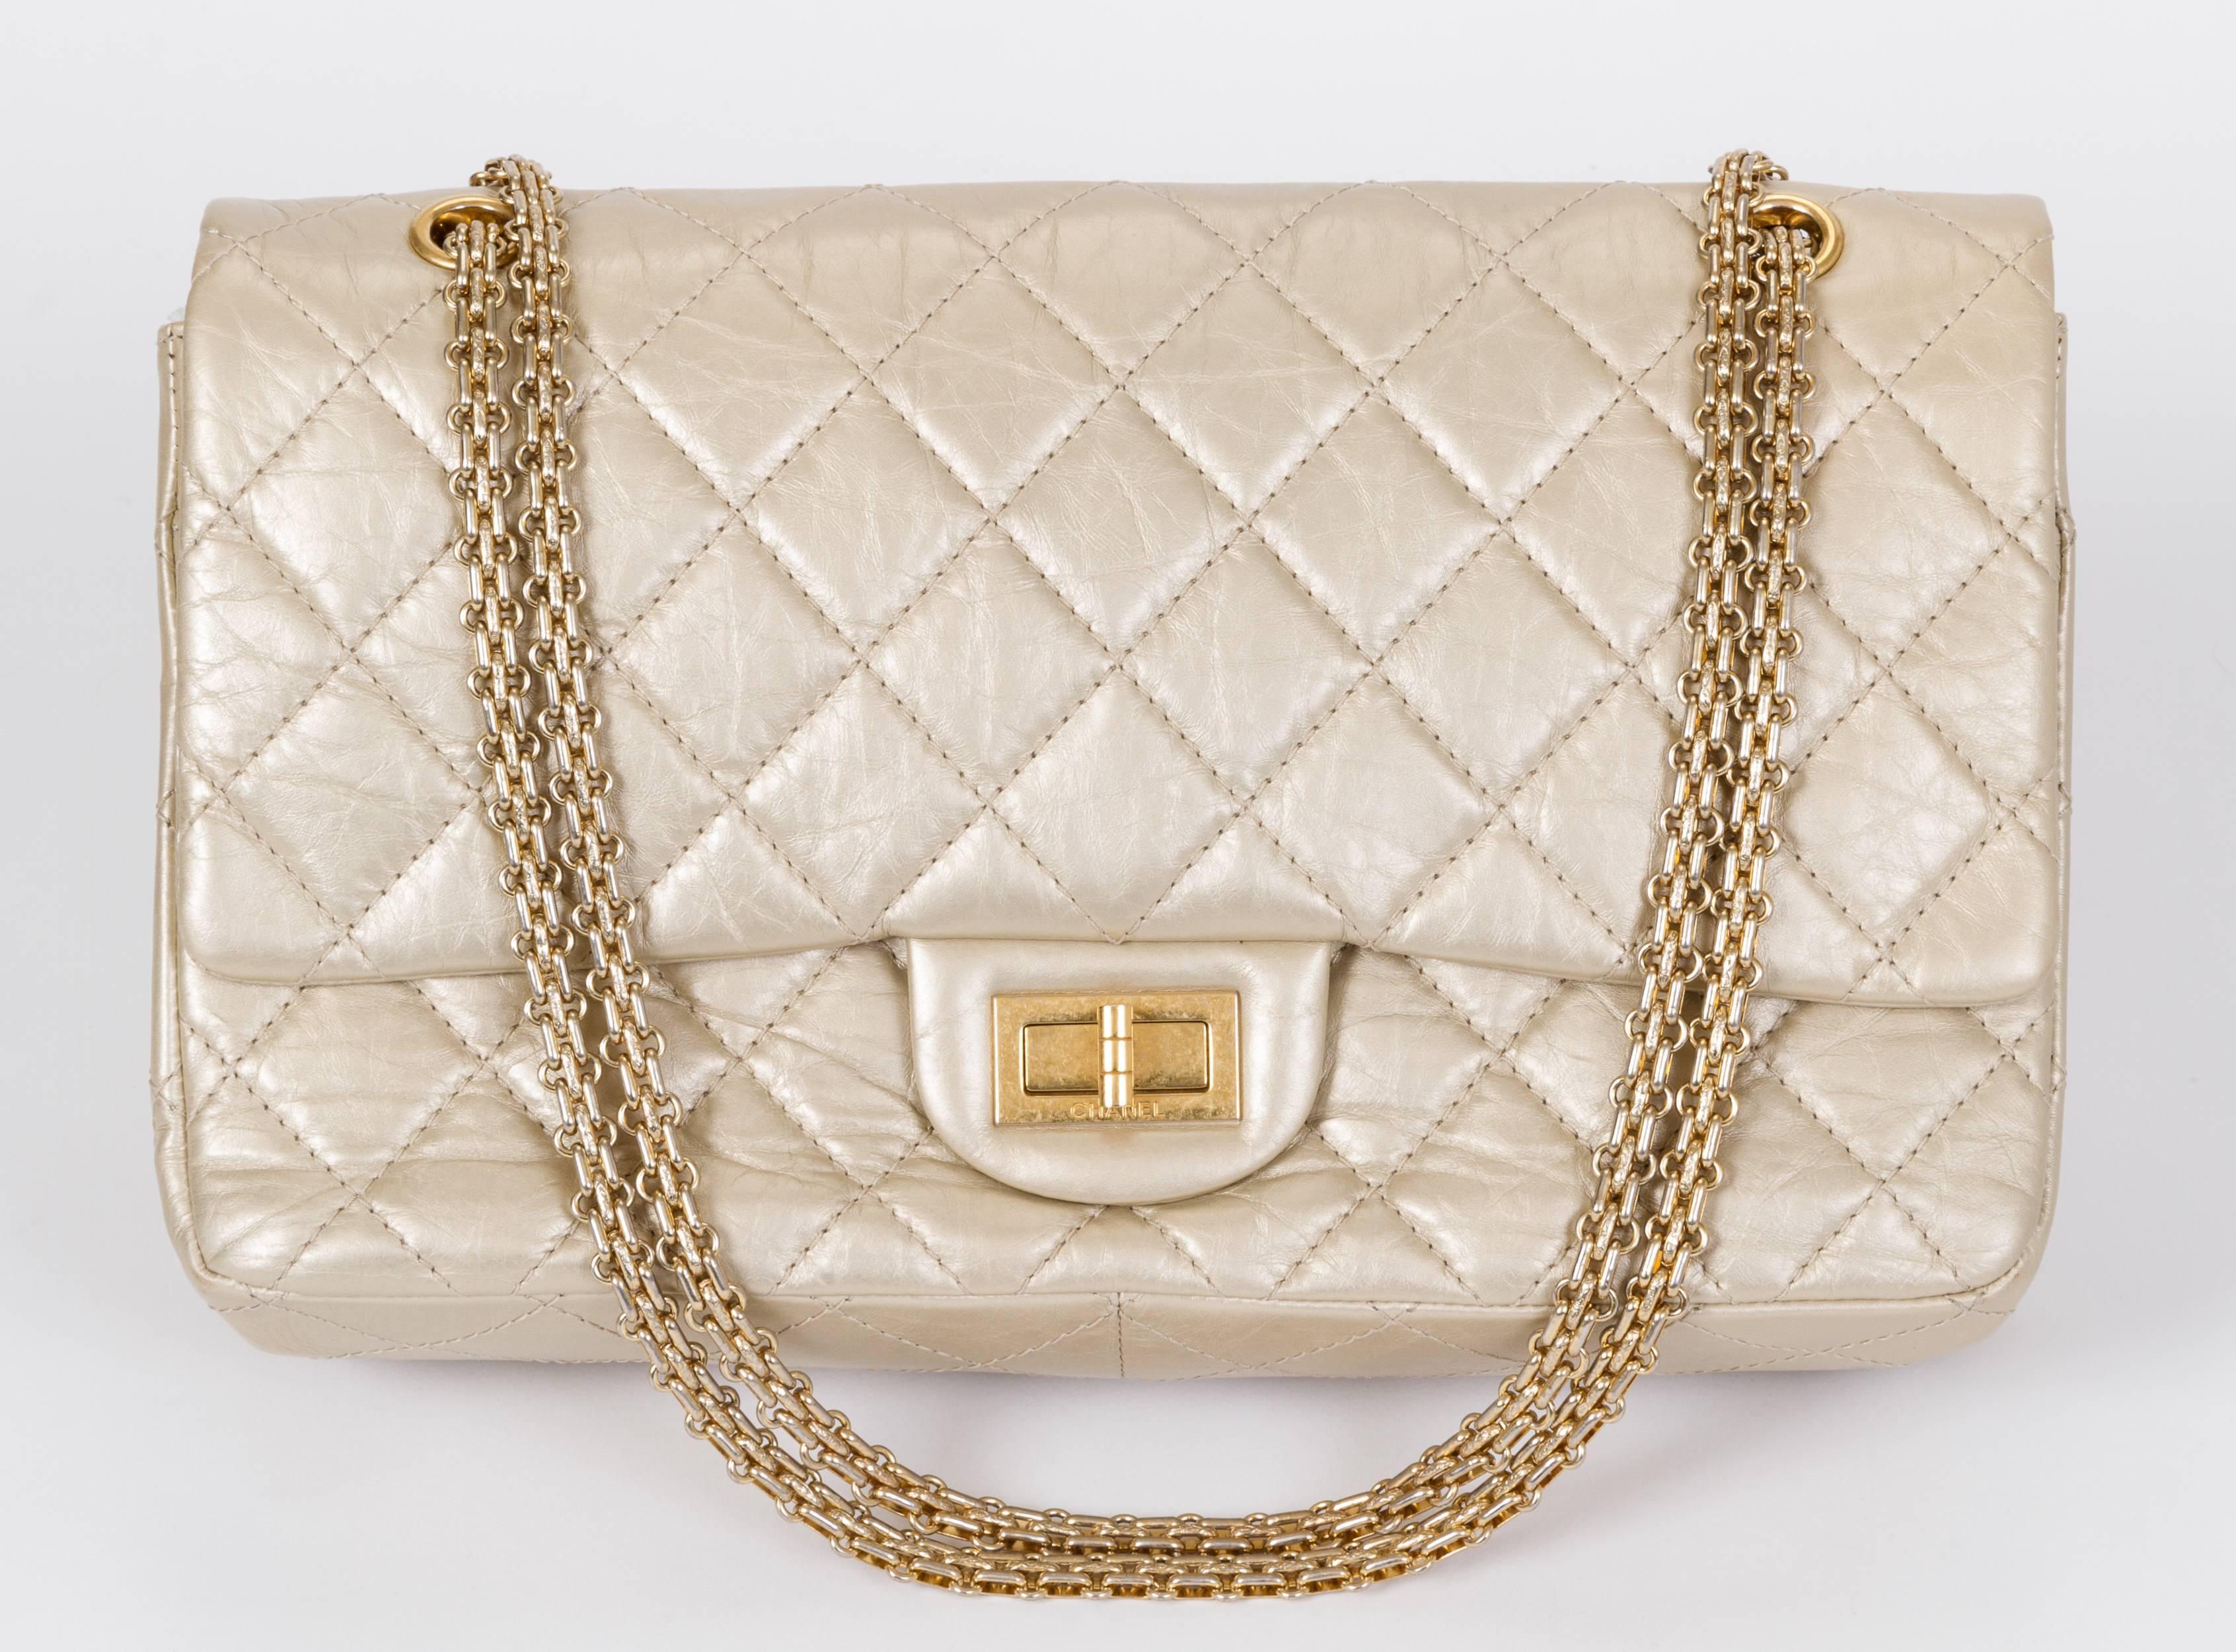 0dd11ca2f86c Chanel Gold Distressed Jumbo Reissue Bag at 1stdibs